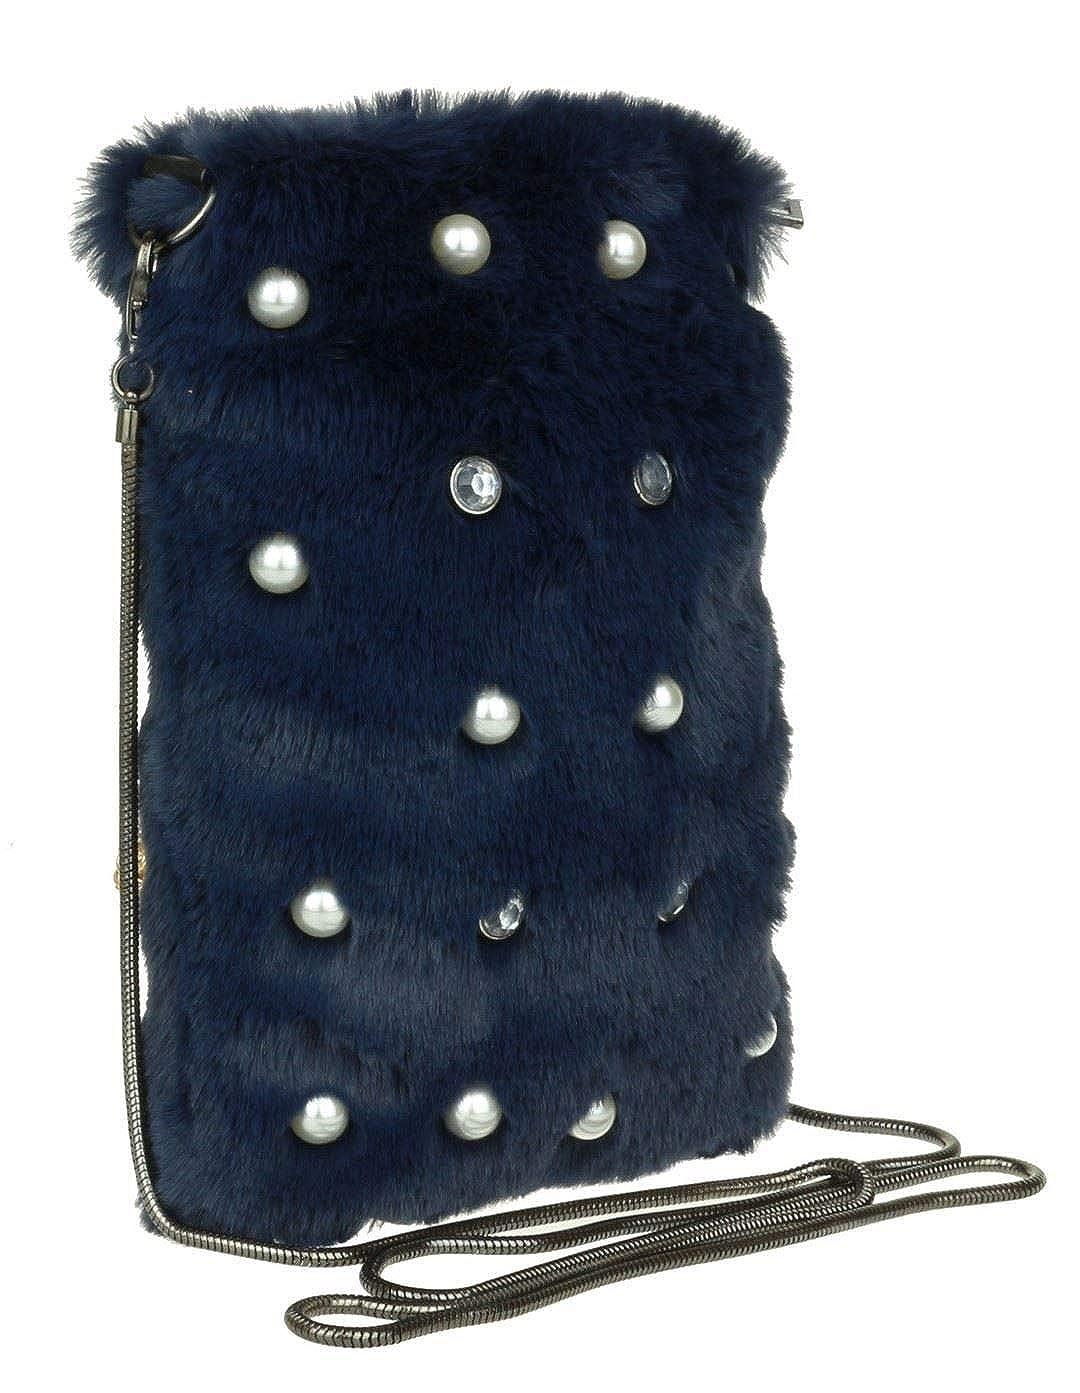 Girly Handbags Perles fourrure Sacs /à main Pochette